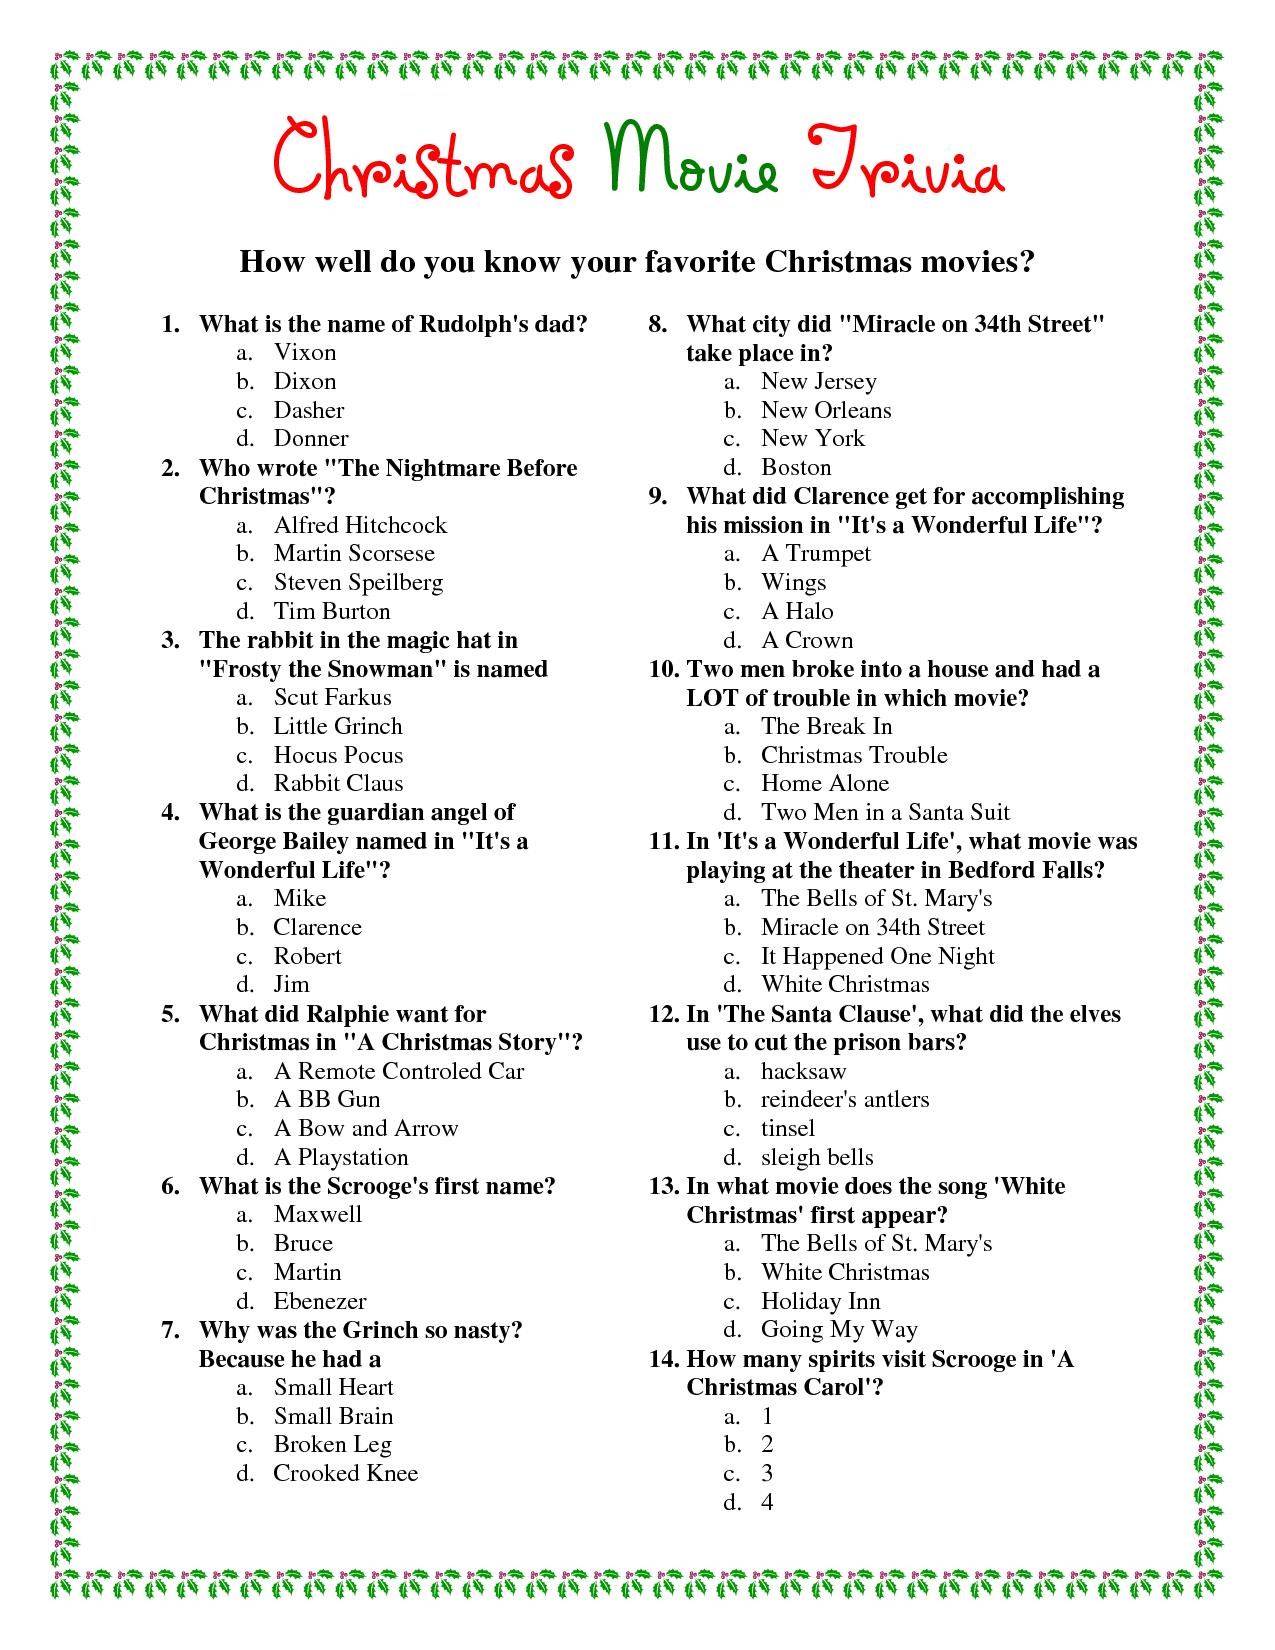 Printable Christmas Movie Trivia.pdf Download Legal Documents - Free Printable Christmas Trivia Quiz